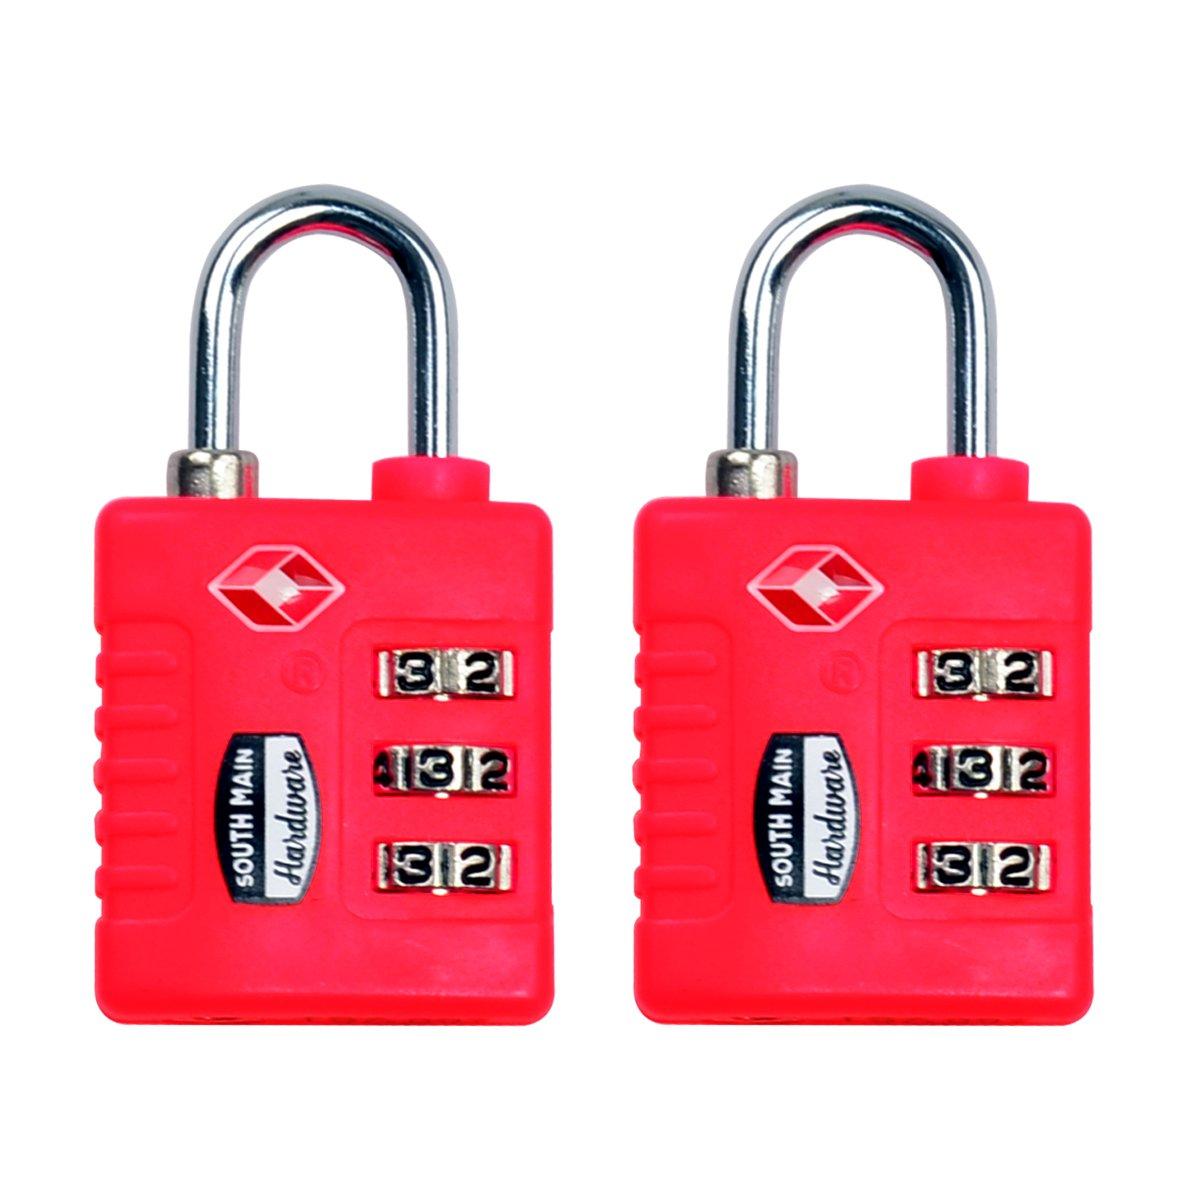 Southメインハードウェア810110 tsa-acceptedリセット可能荷物ロック2パック、パープル 810109 2 B01C3ZVVR0 ピンク